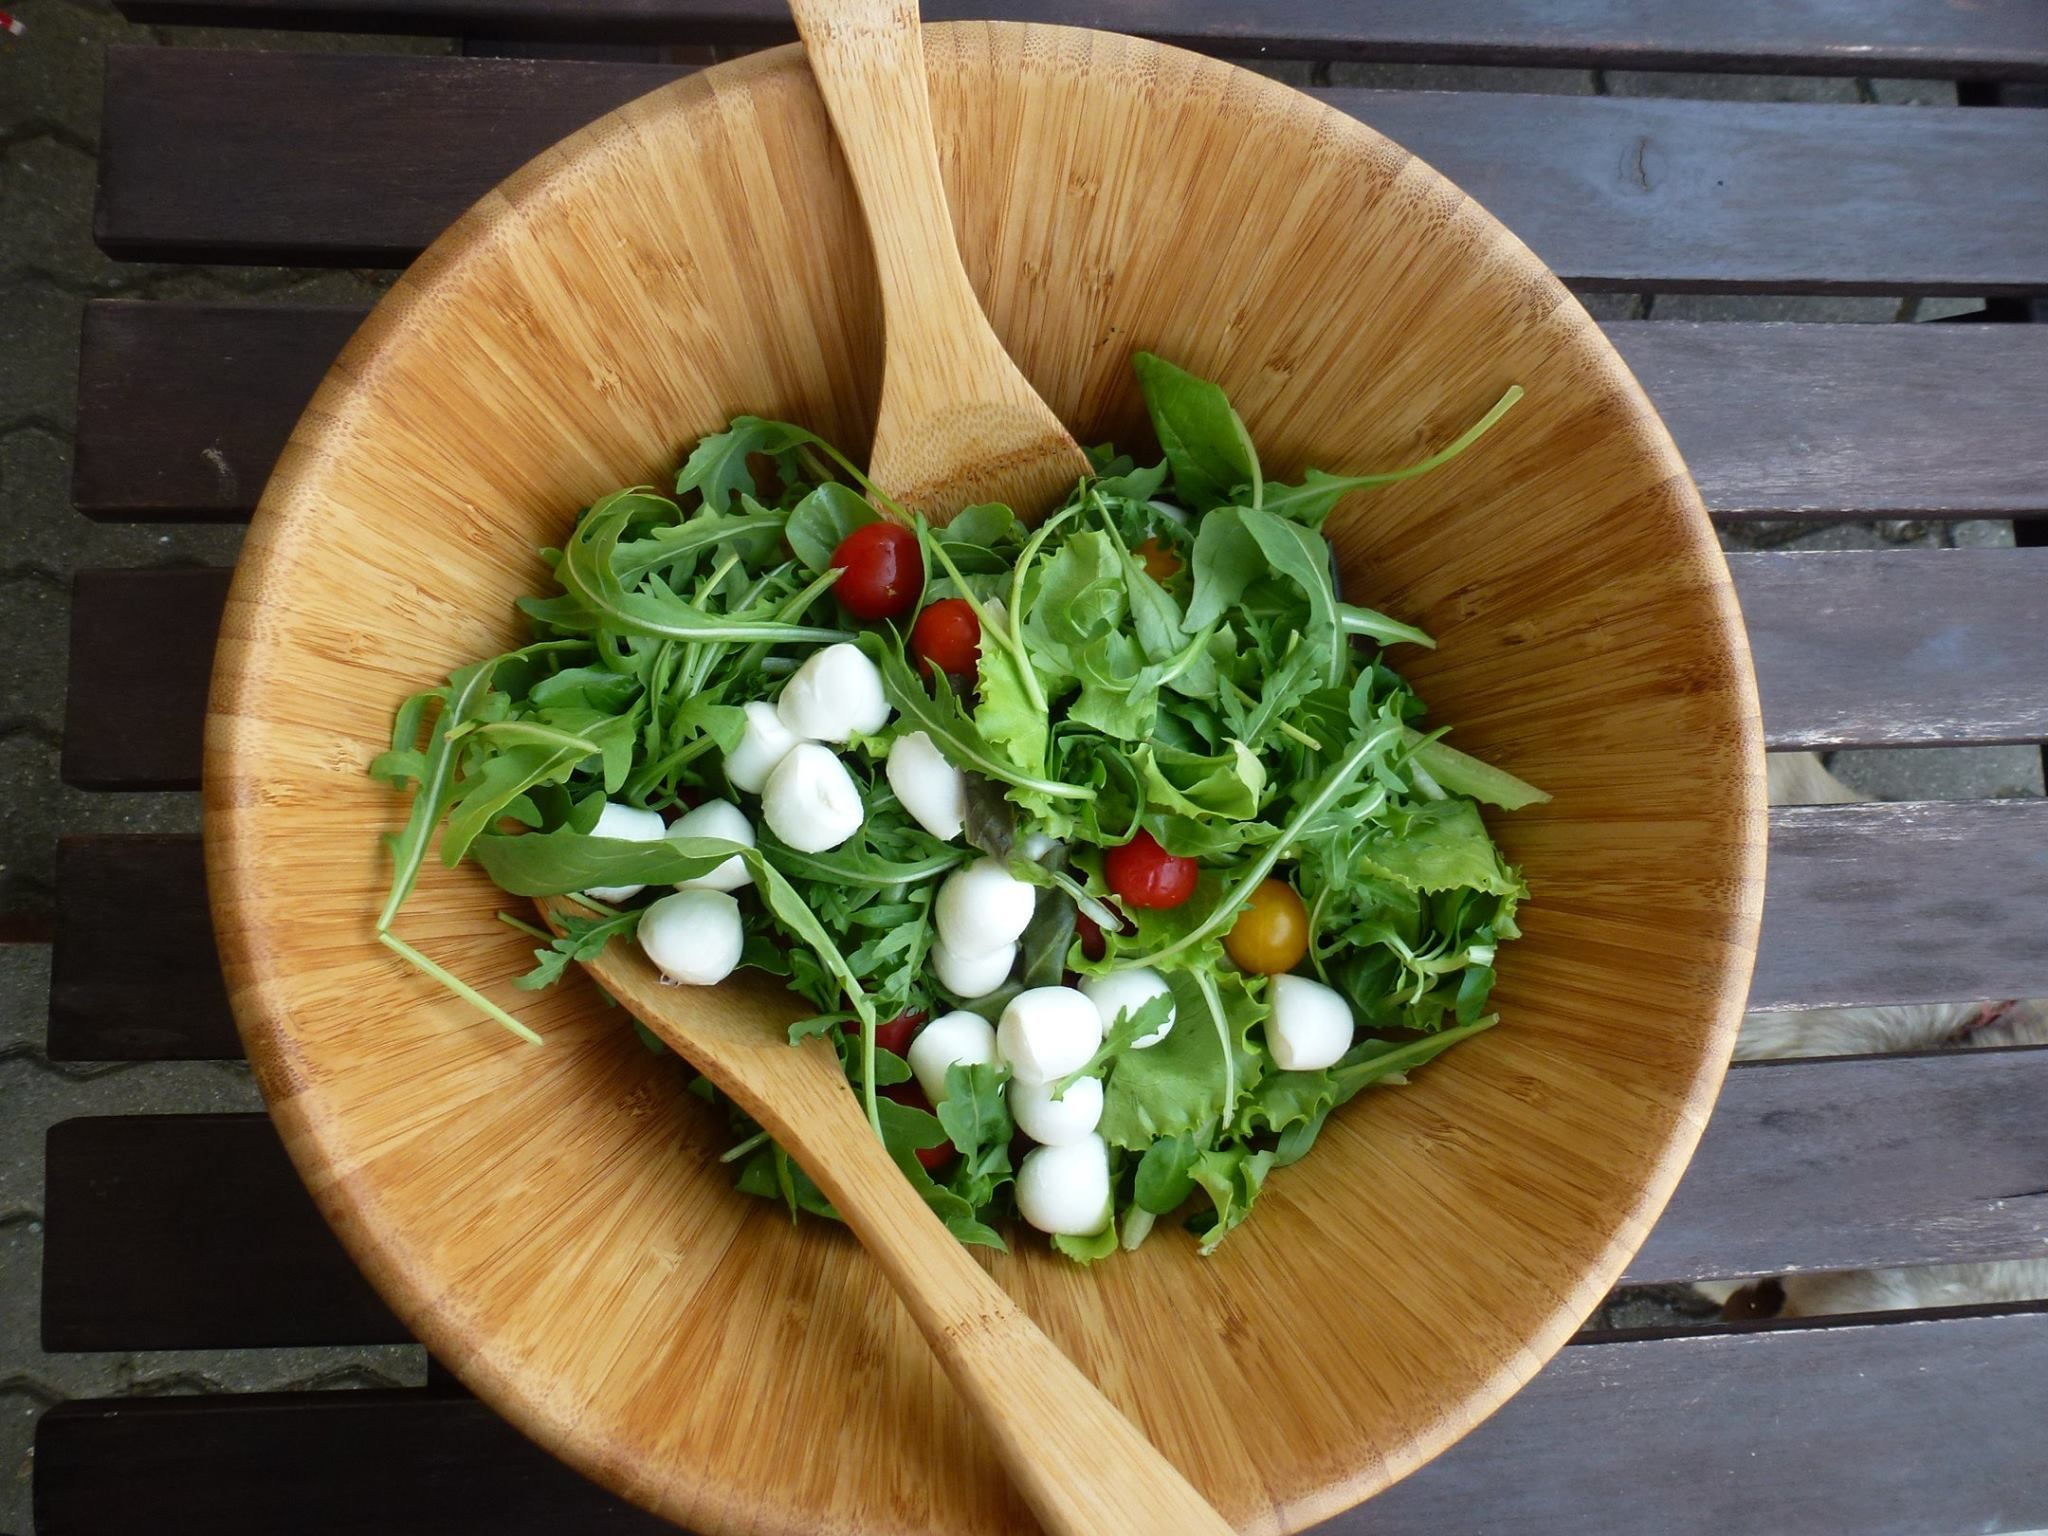 Zeleninový šalát s baby mozzarellou a paradajkami ... www.vinopredaj.sk  #mozzarella #tomato #paradajka #salat #pomodoro #delikatesy #delishop #inmedio